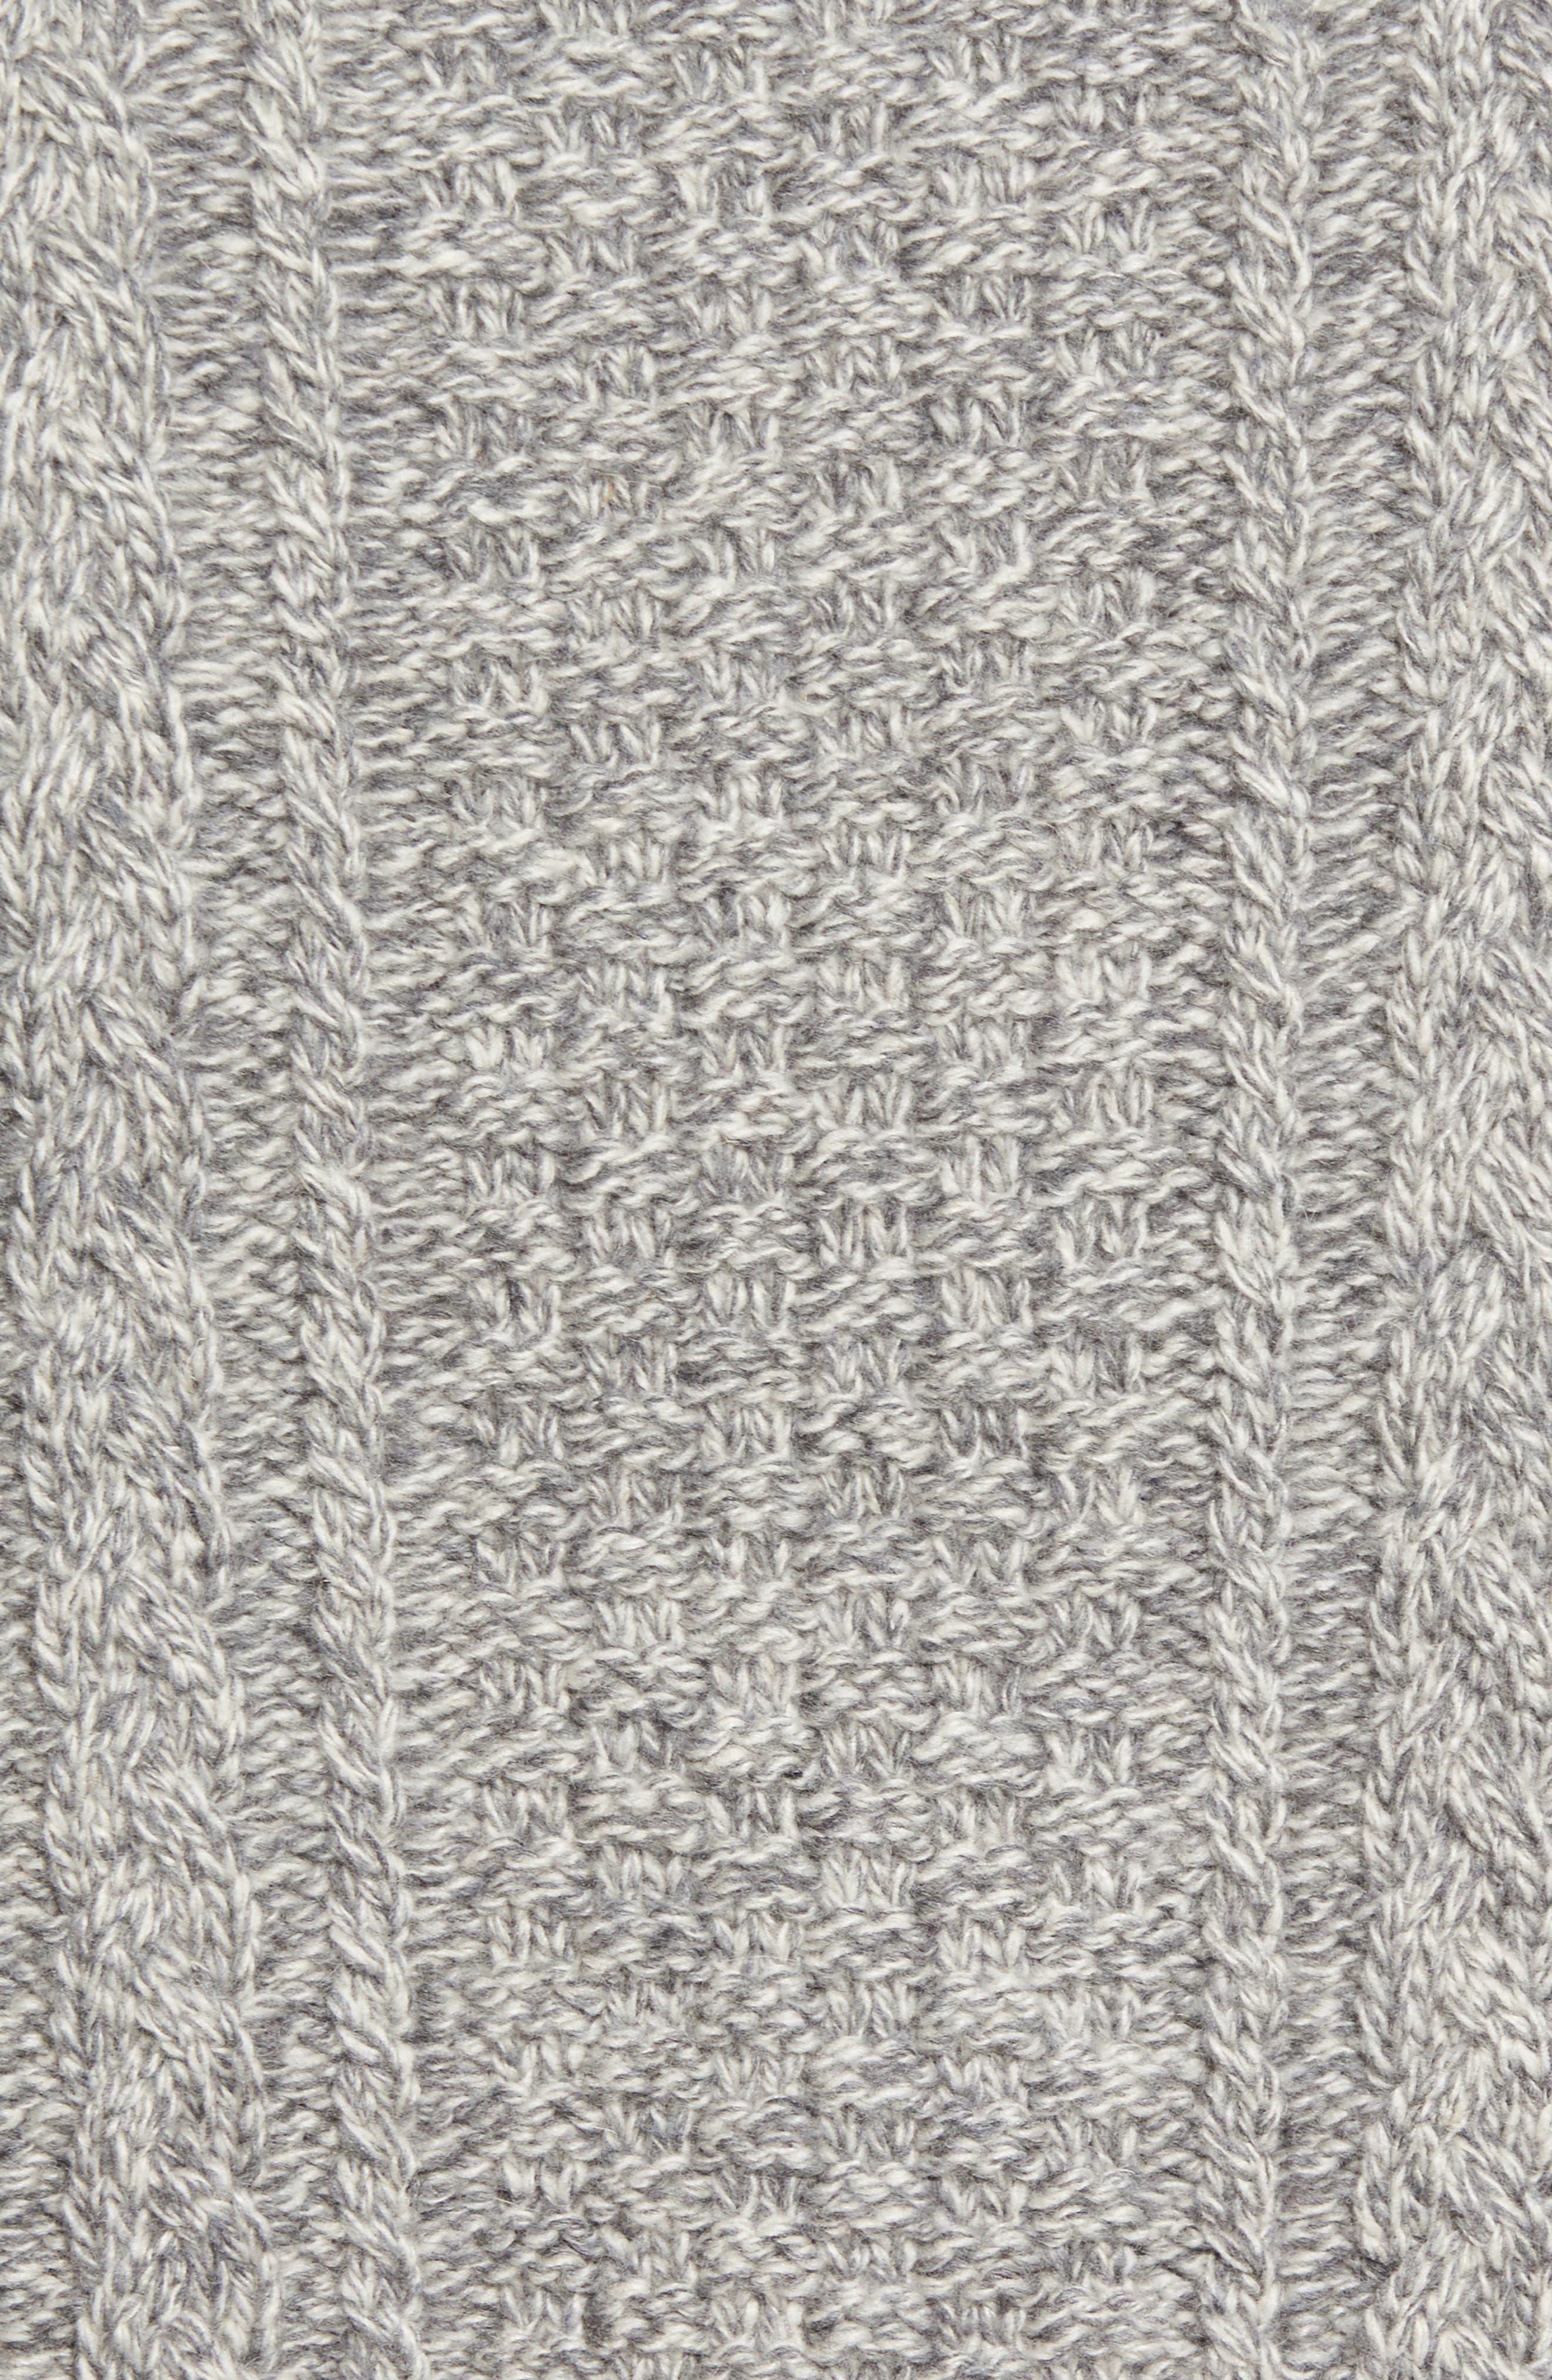 Fisherman Knit Wool Blend Sweater,                             Alternate thumbnail 9, color,